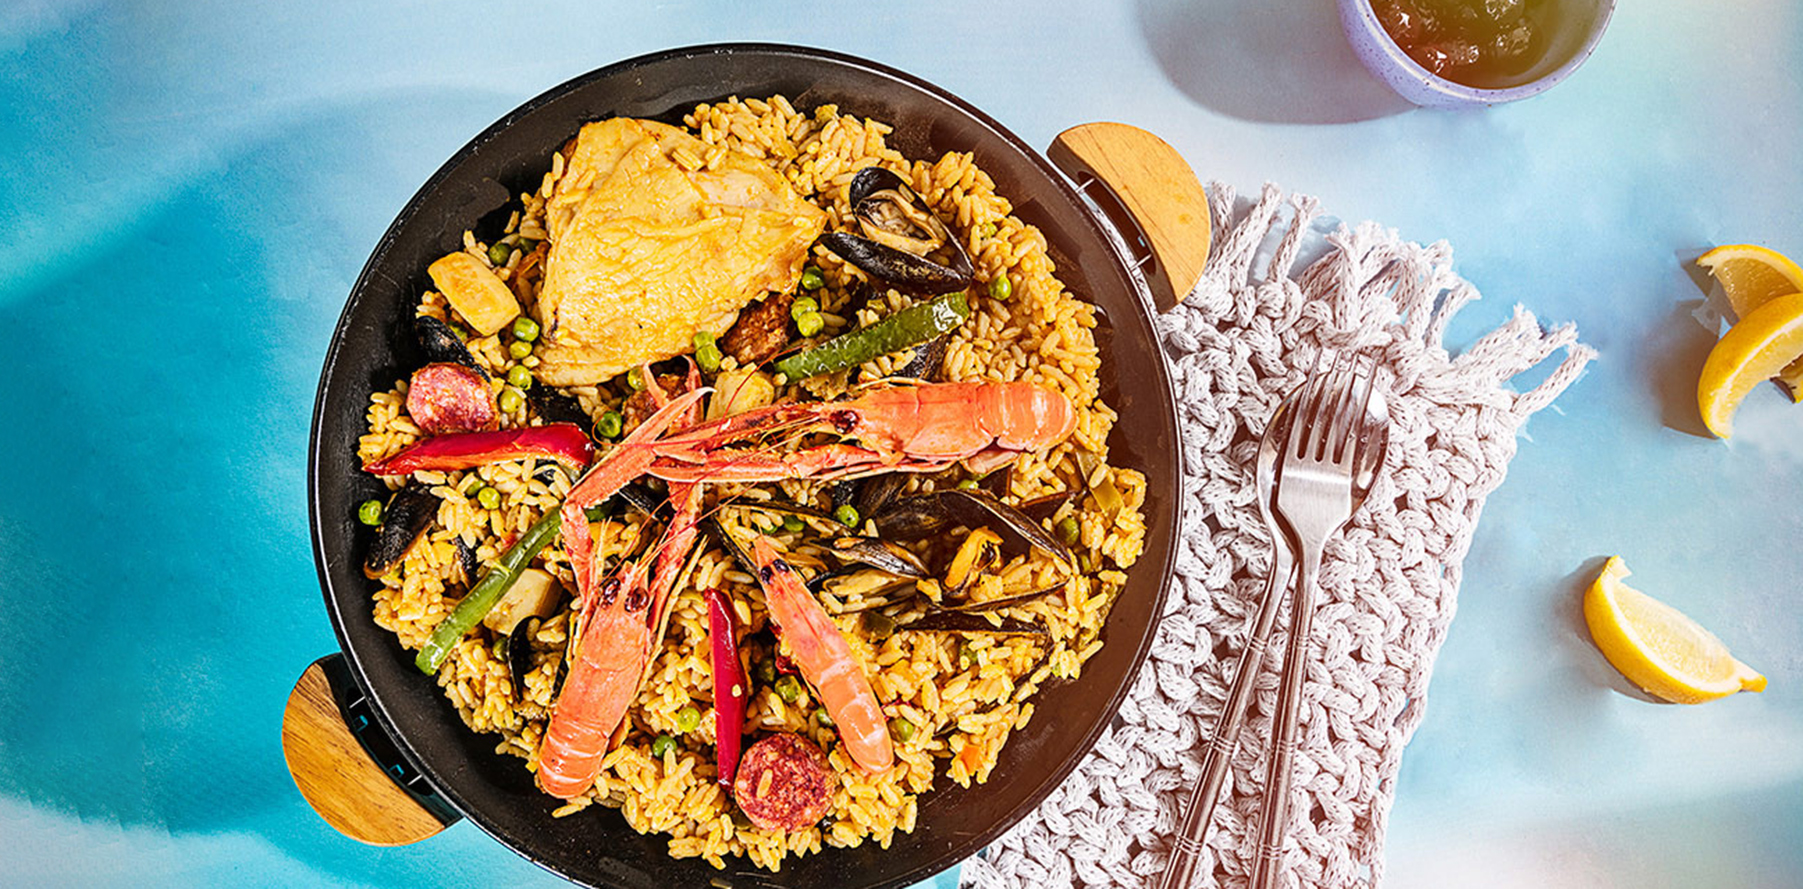 photo-oelron-studio-plat-cuisine-copie